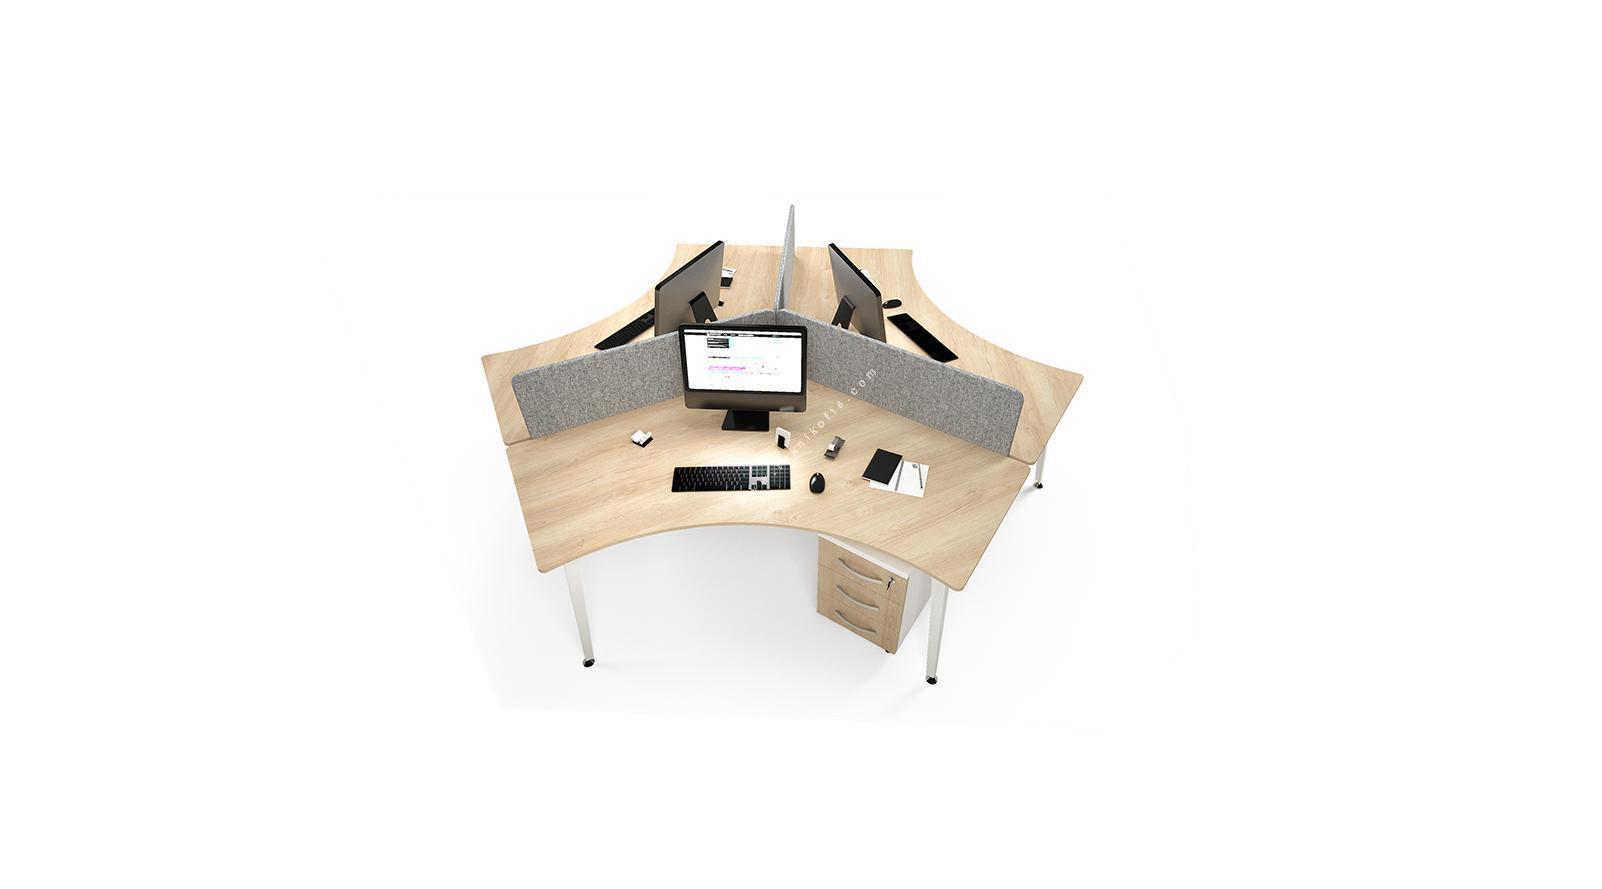 centrawork kumaş seperatörlü üçlü çalışma masası